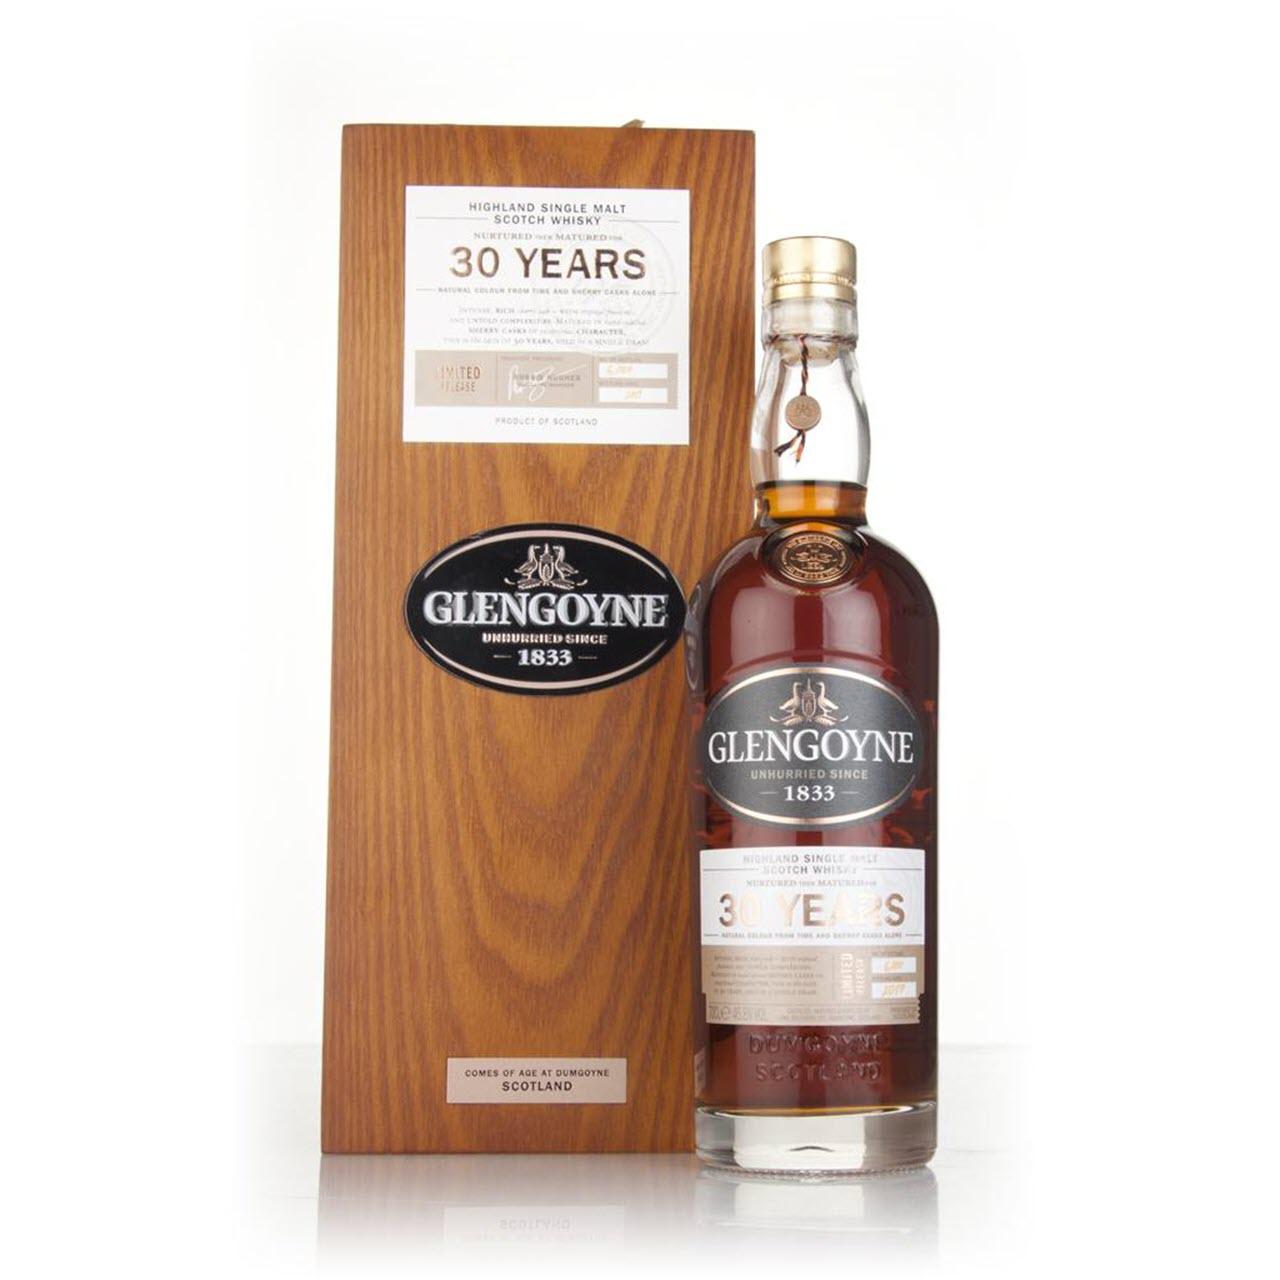 Glengoyne 30 YO